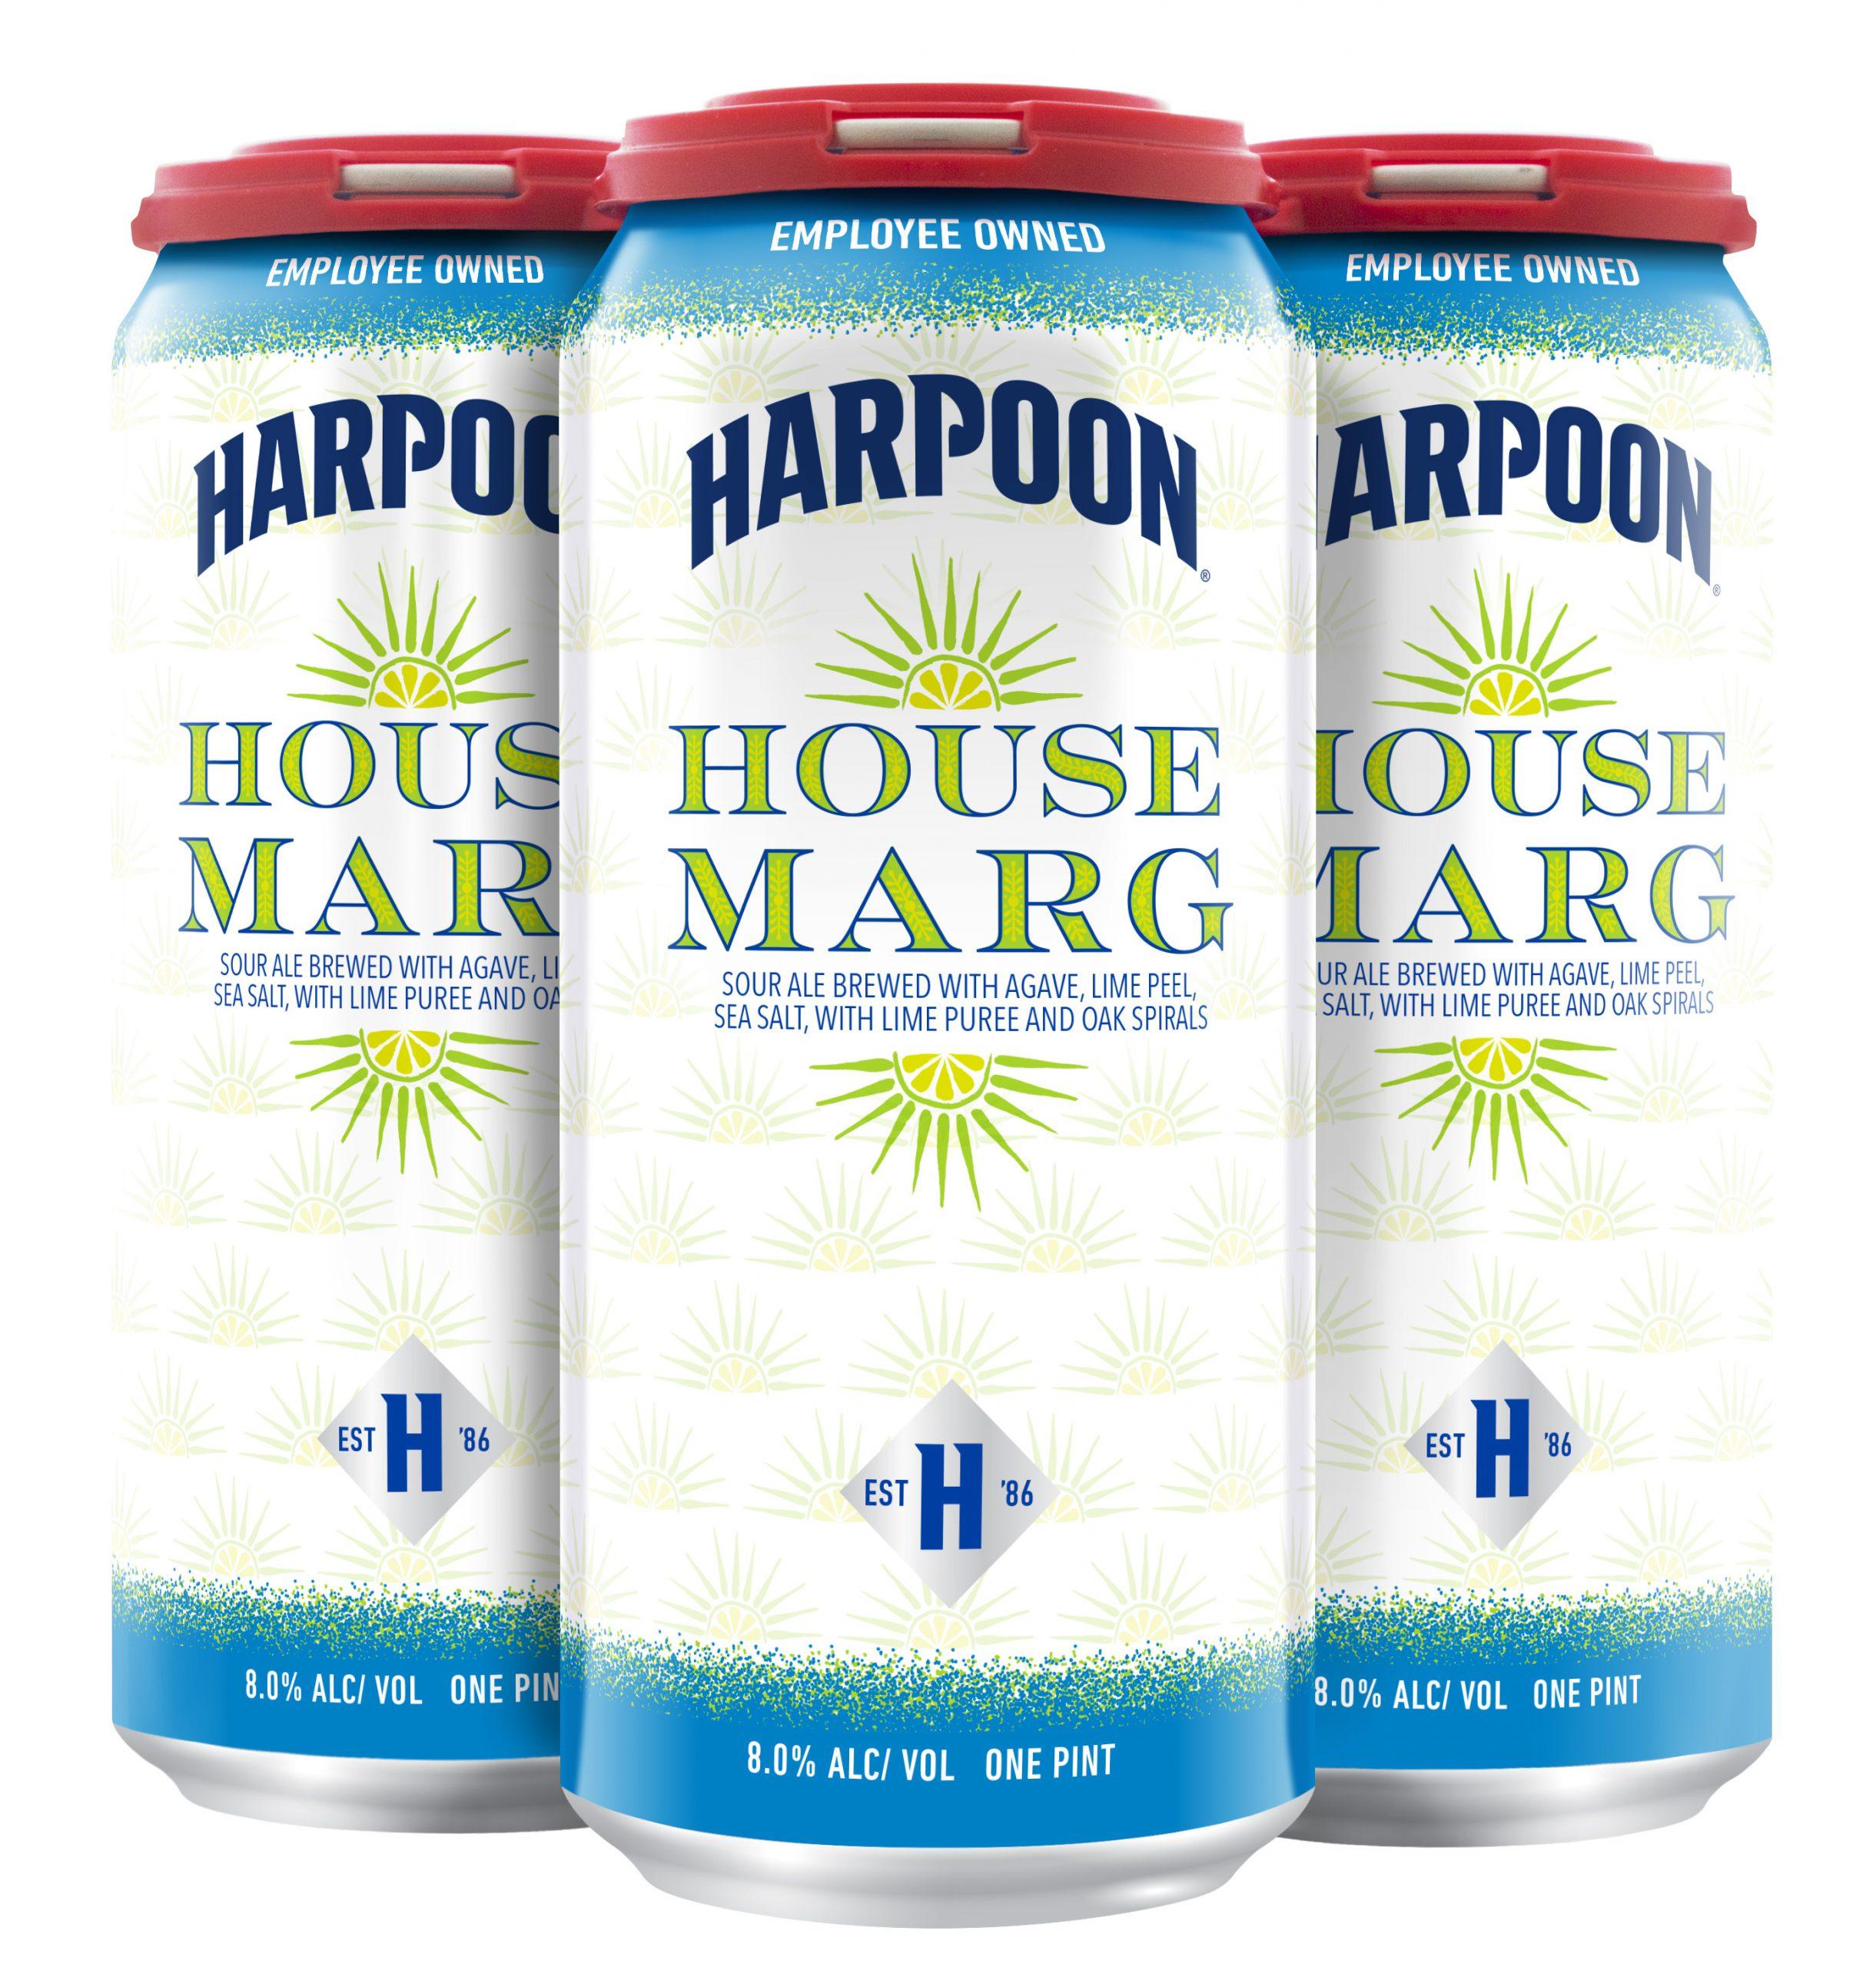 Harpoon House Marg 16CAN 4PK